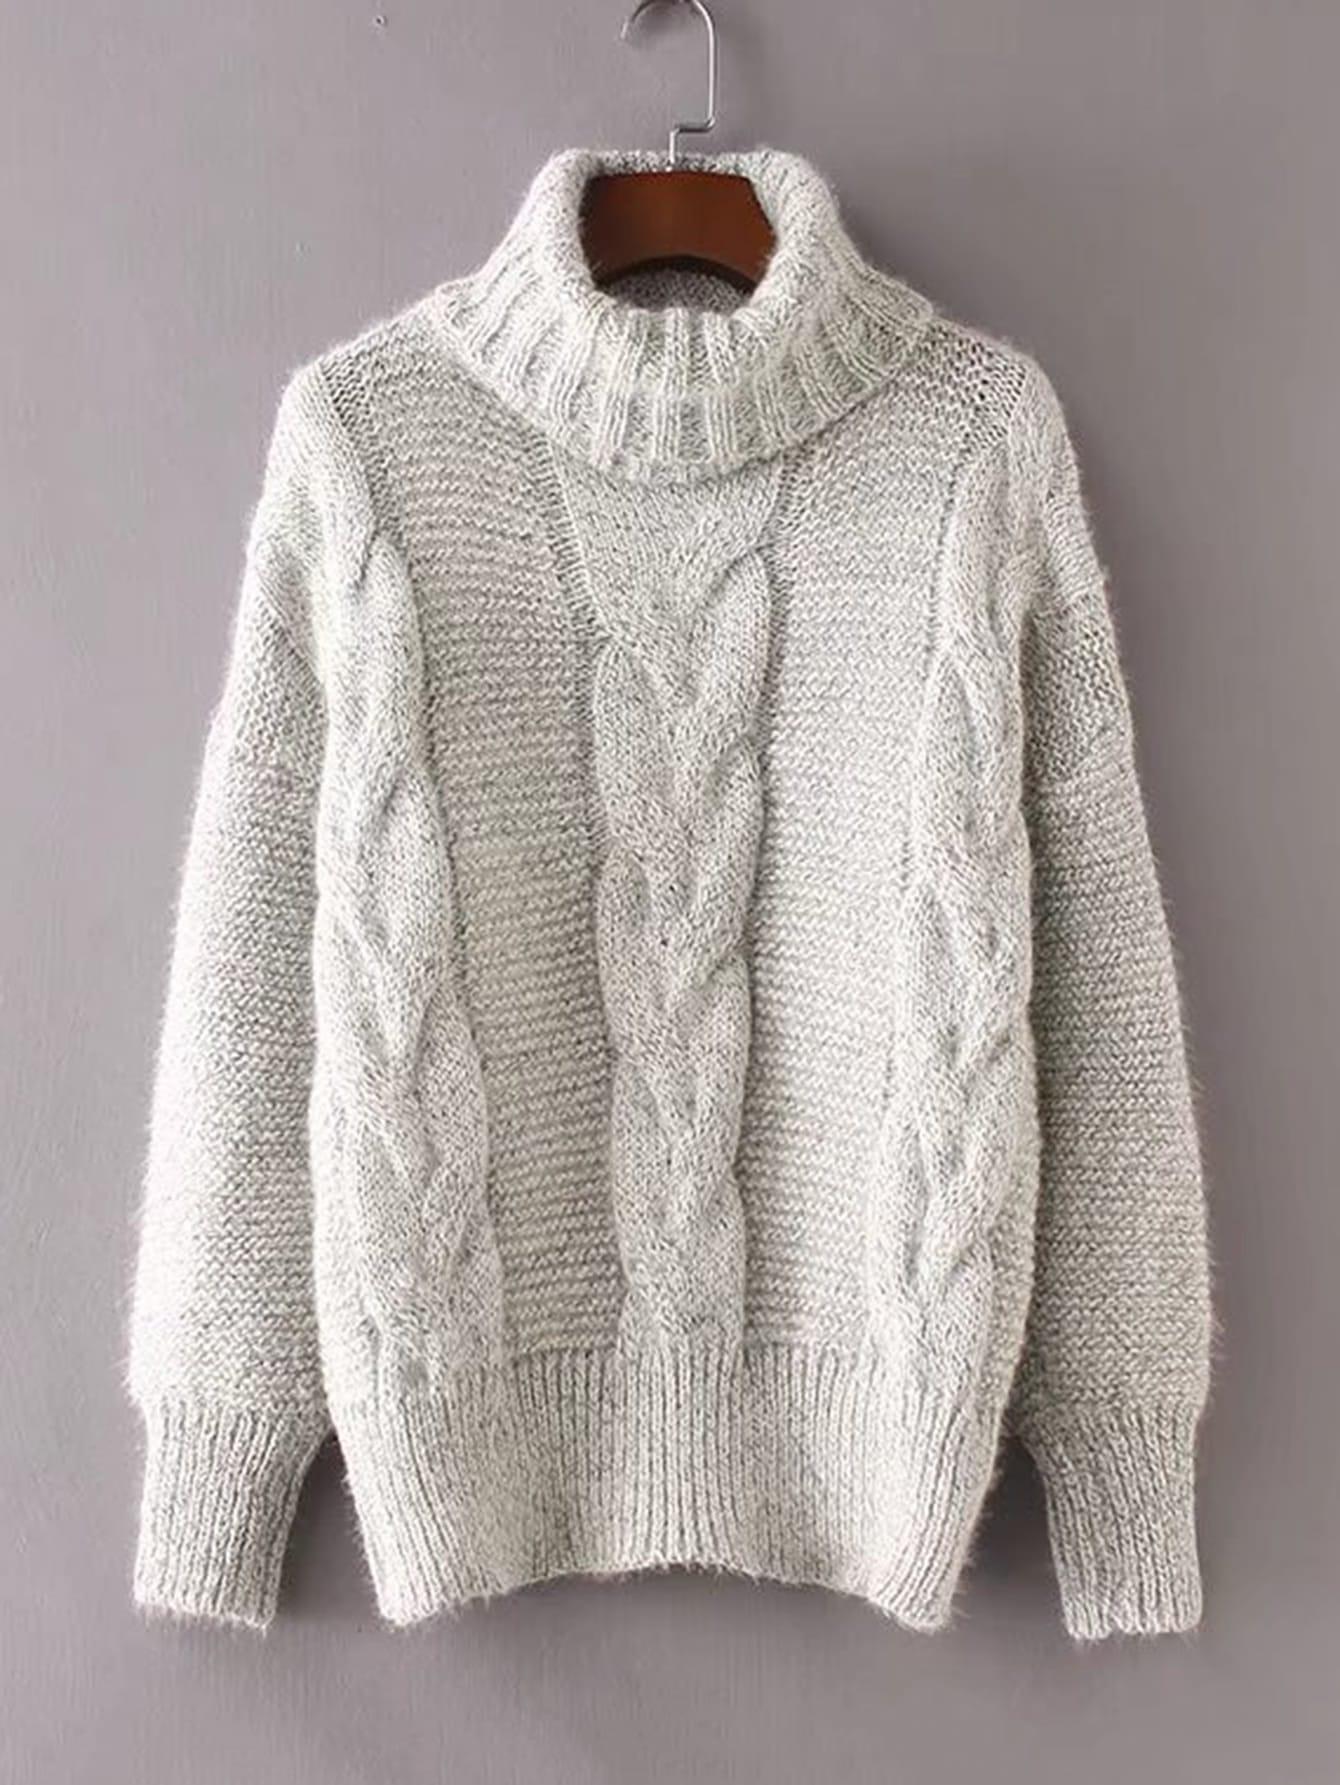 Suéter de cuello alto tejido de cable -Spanish ROMWE